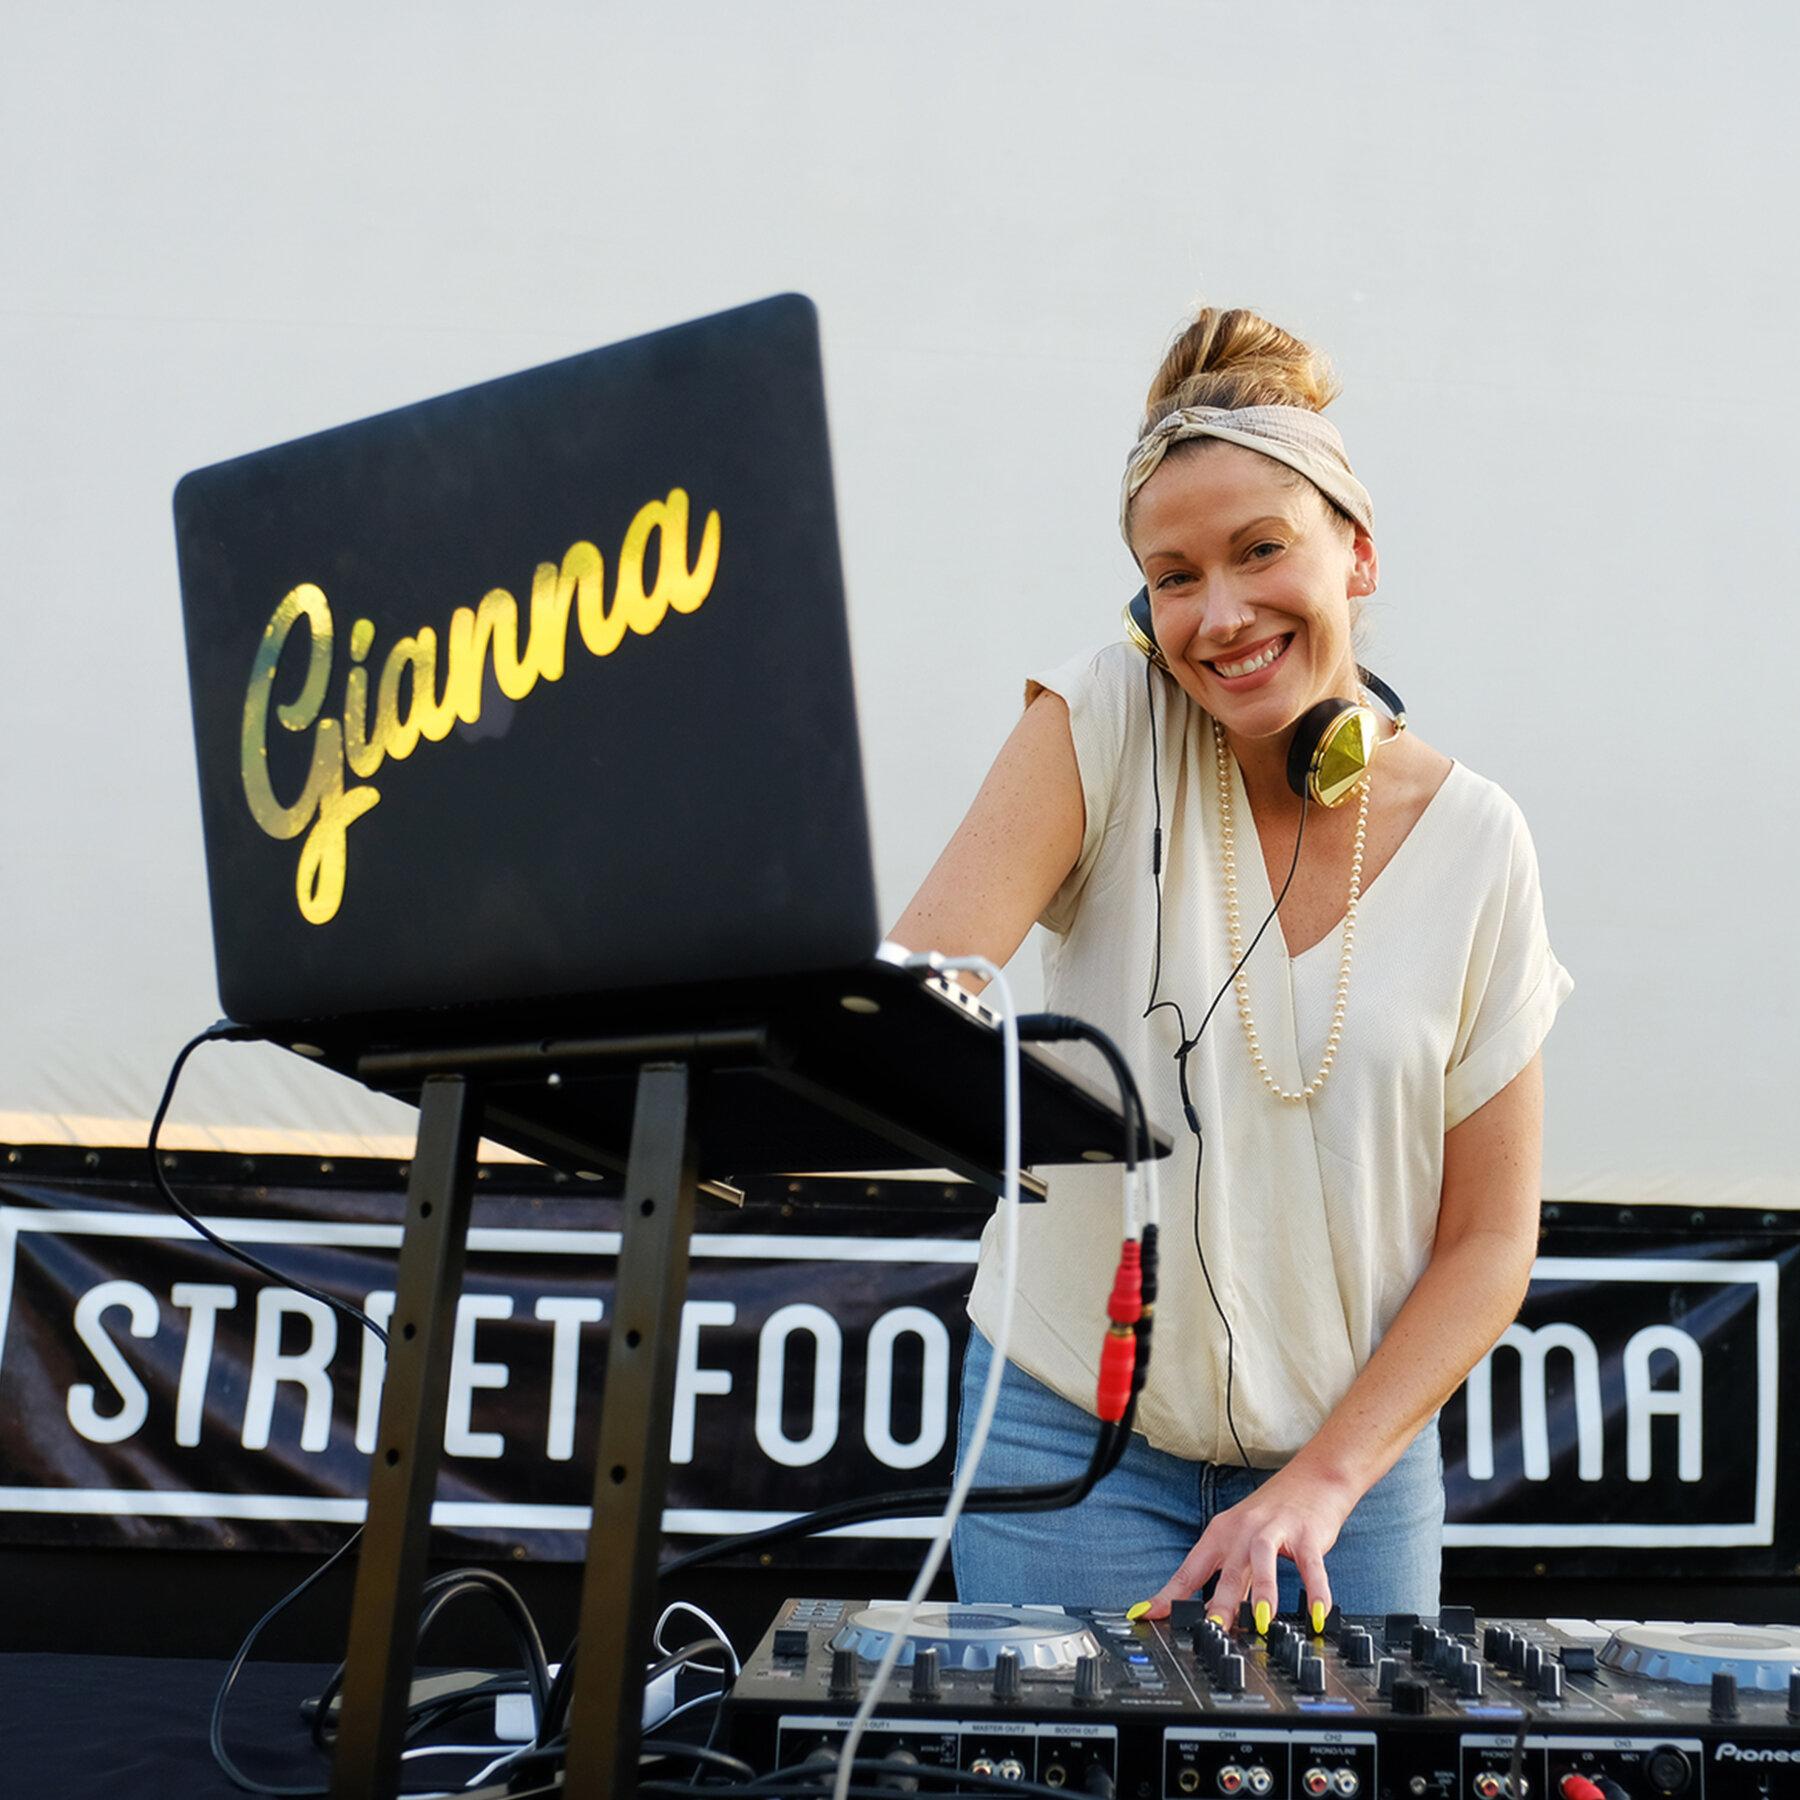 DJ Gianna Prism DJs Street Food Cinema.jpg